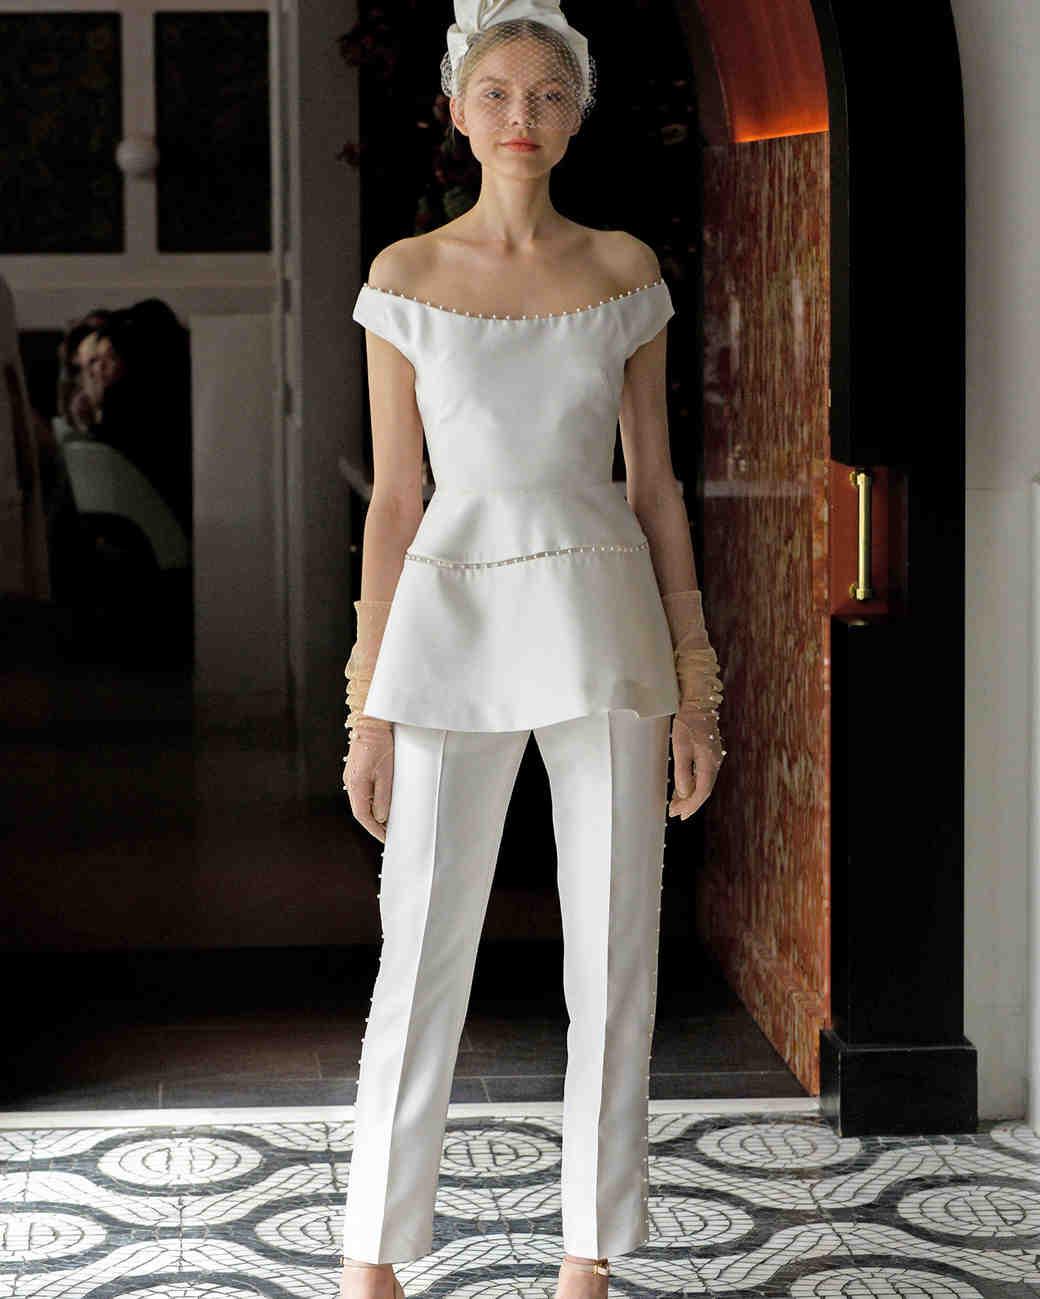 Dress white pants for women